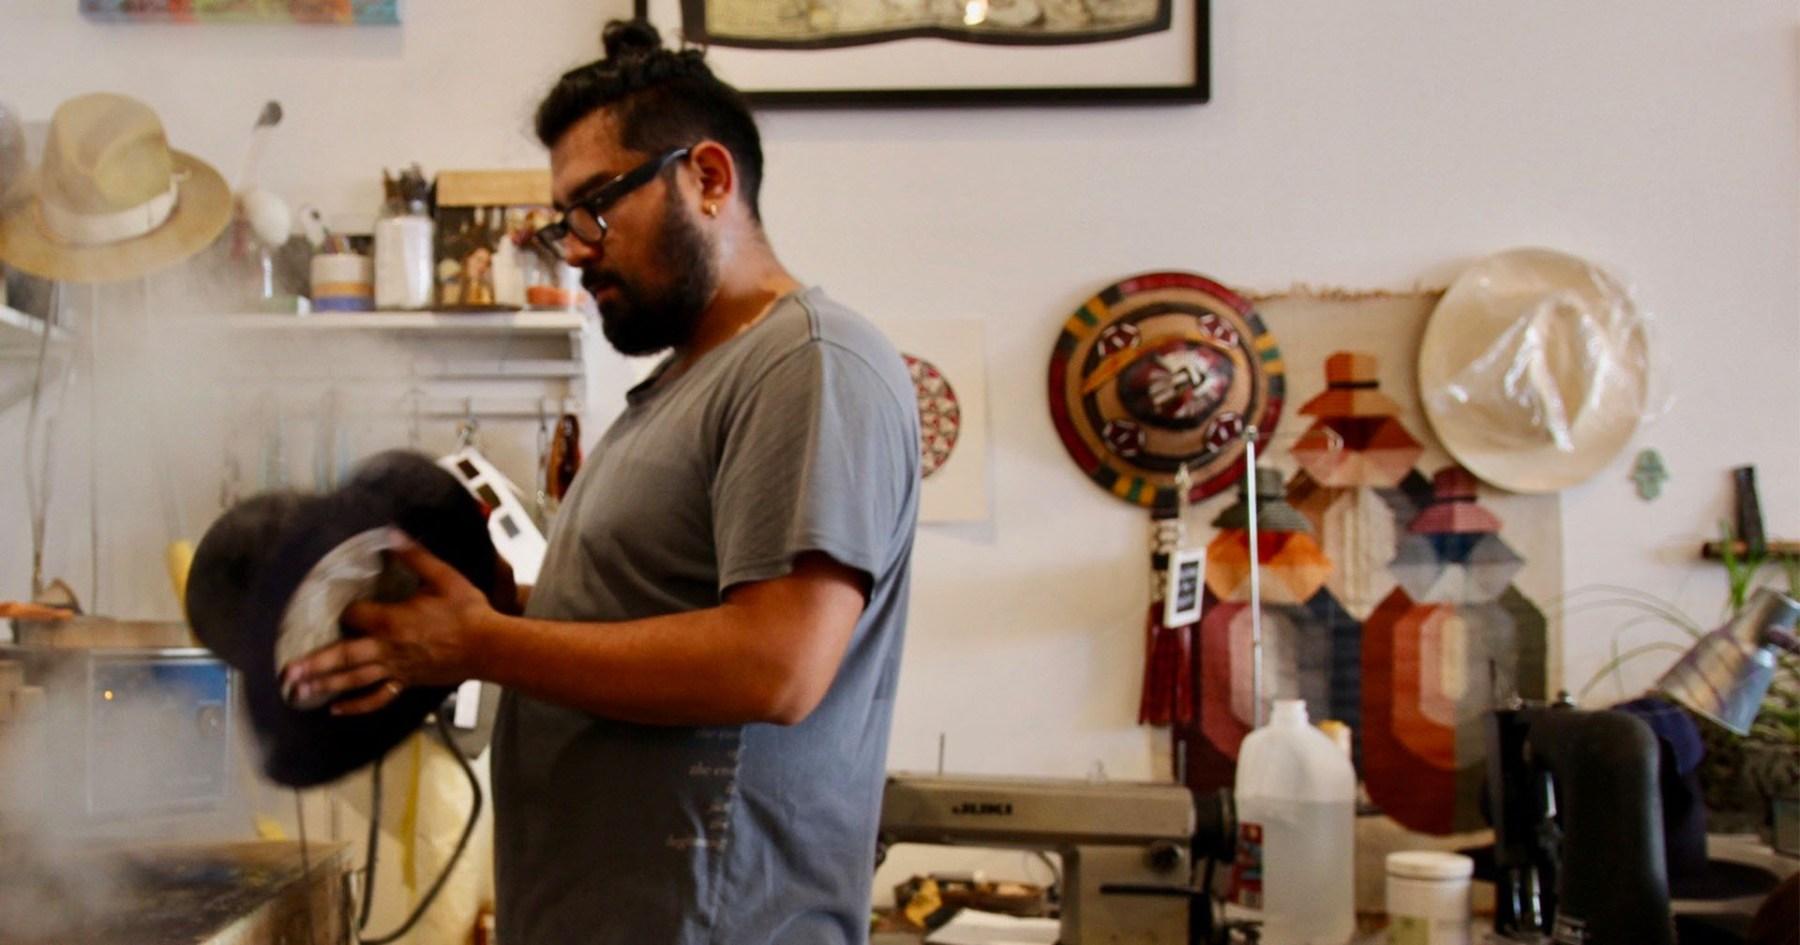 LA's Hatmaker Nonpareil Just Launched His Own Brand